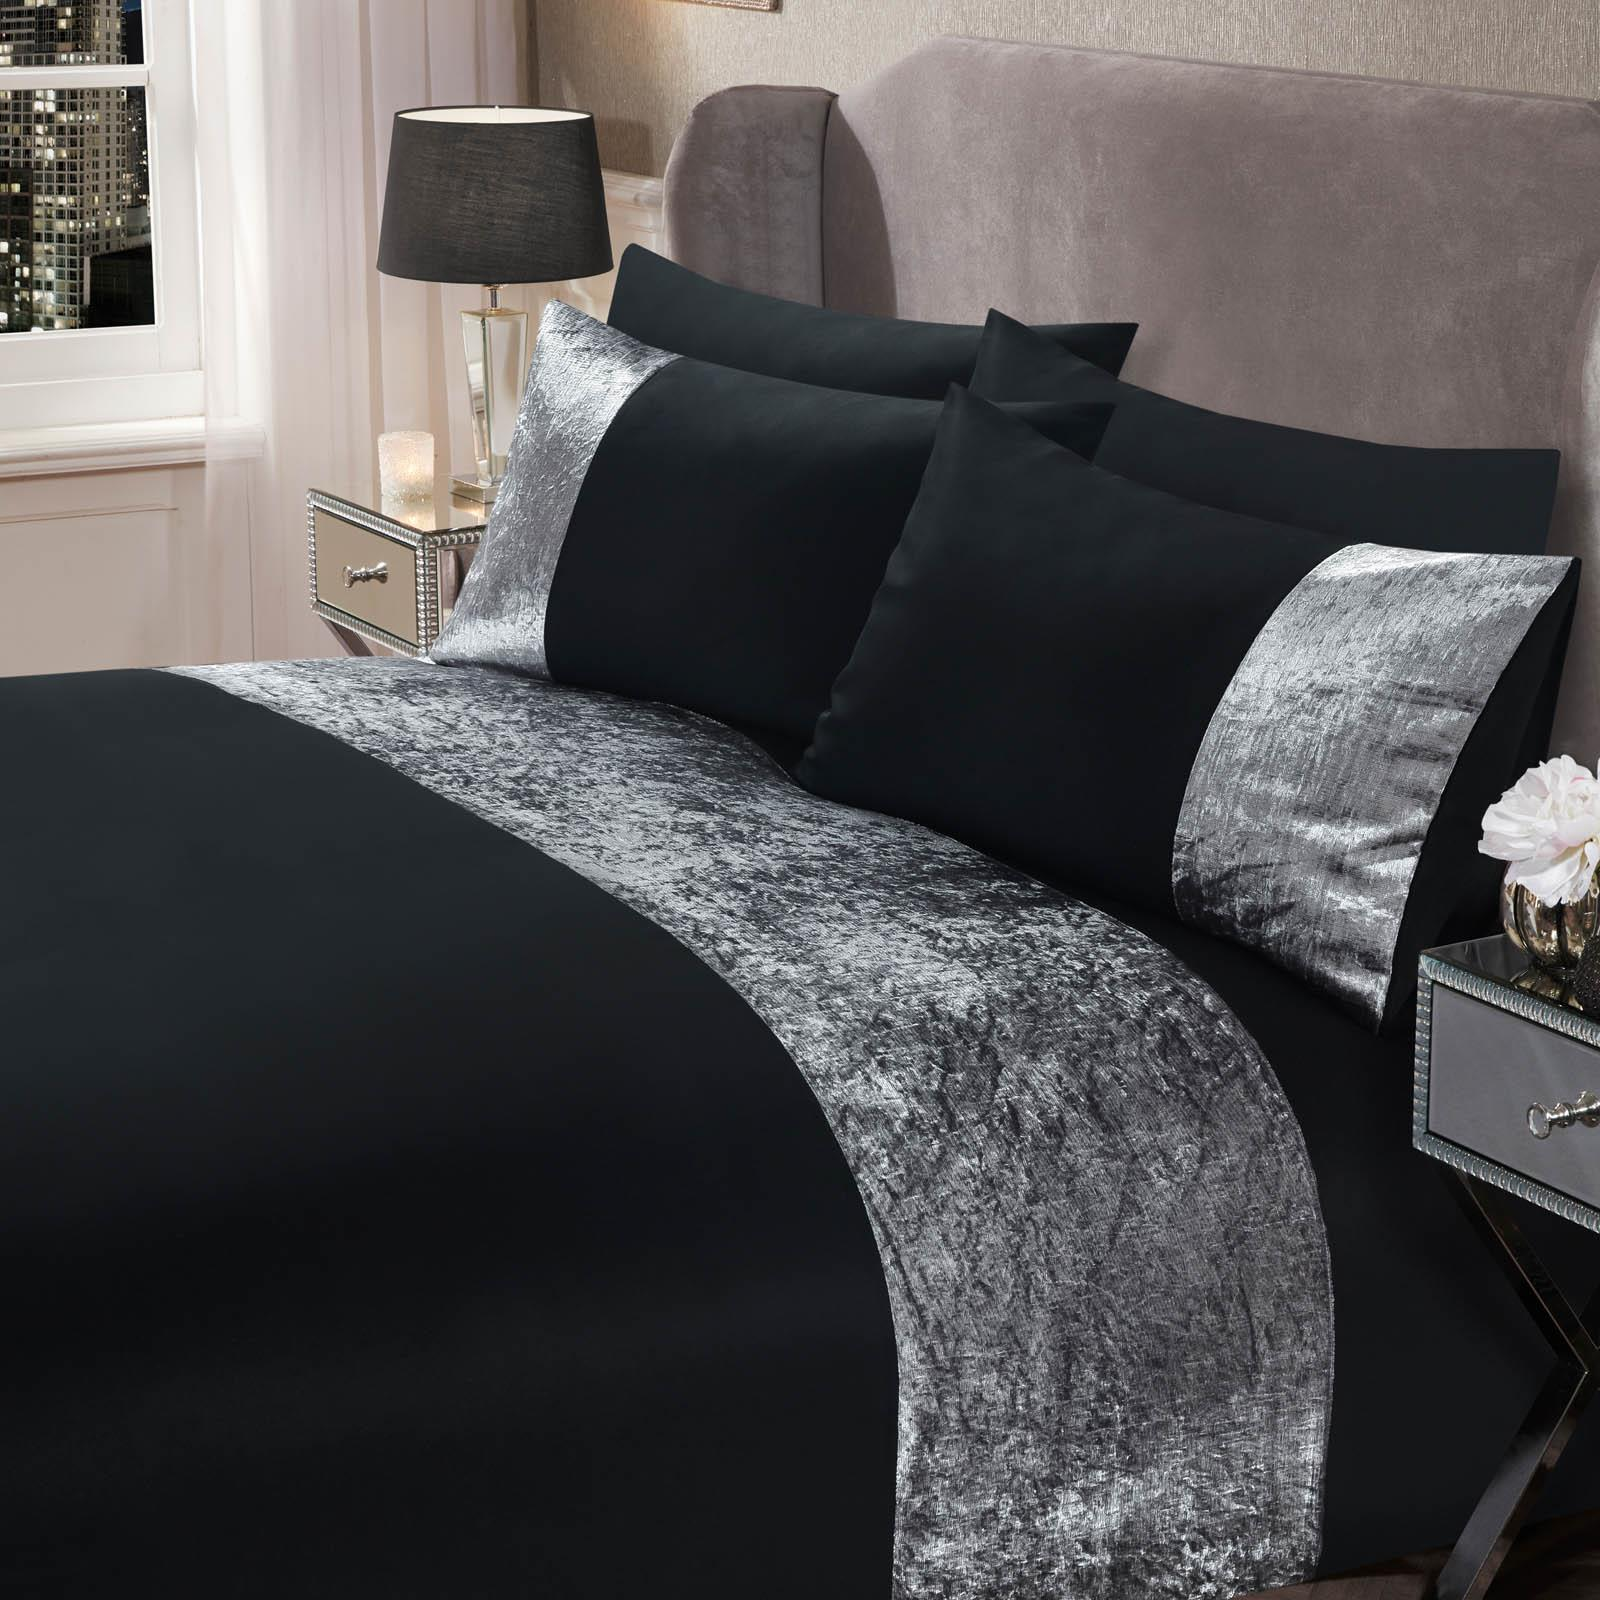 thumbnail 10 - Sienna Crushed Velvet Panel Duvet Cover with Pillow Case Bedding Set Silver Grey